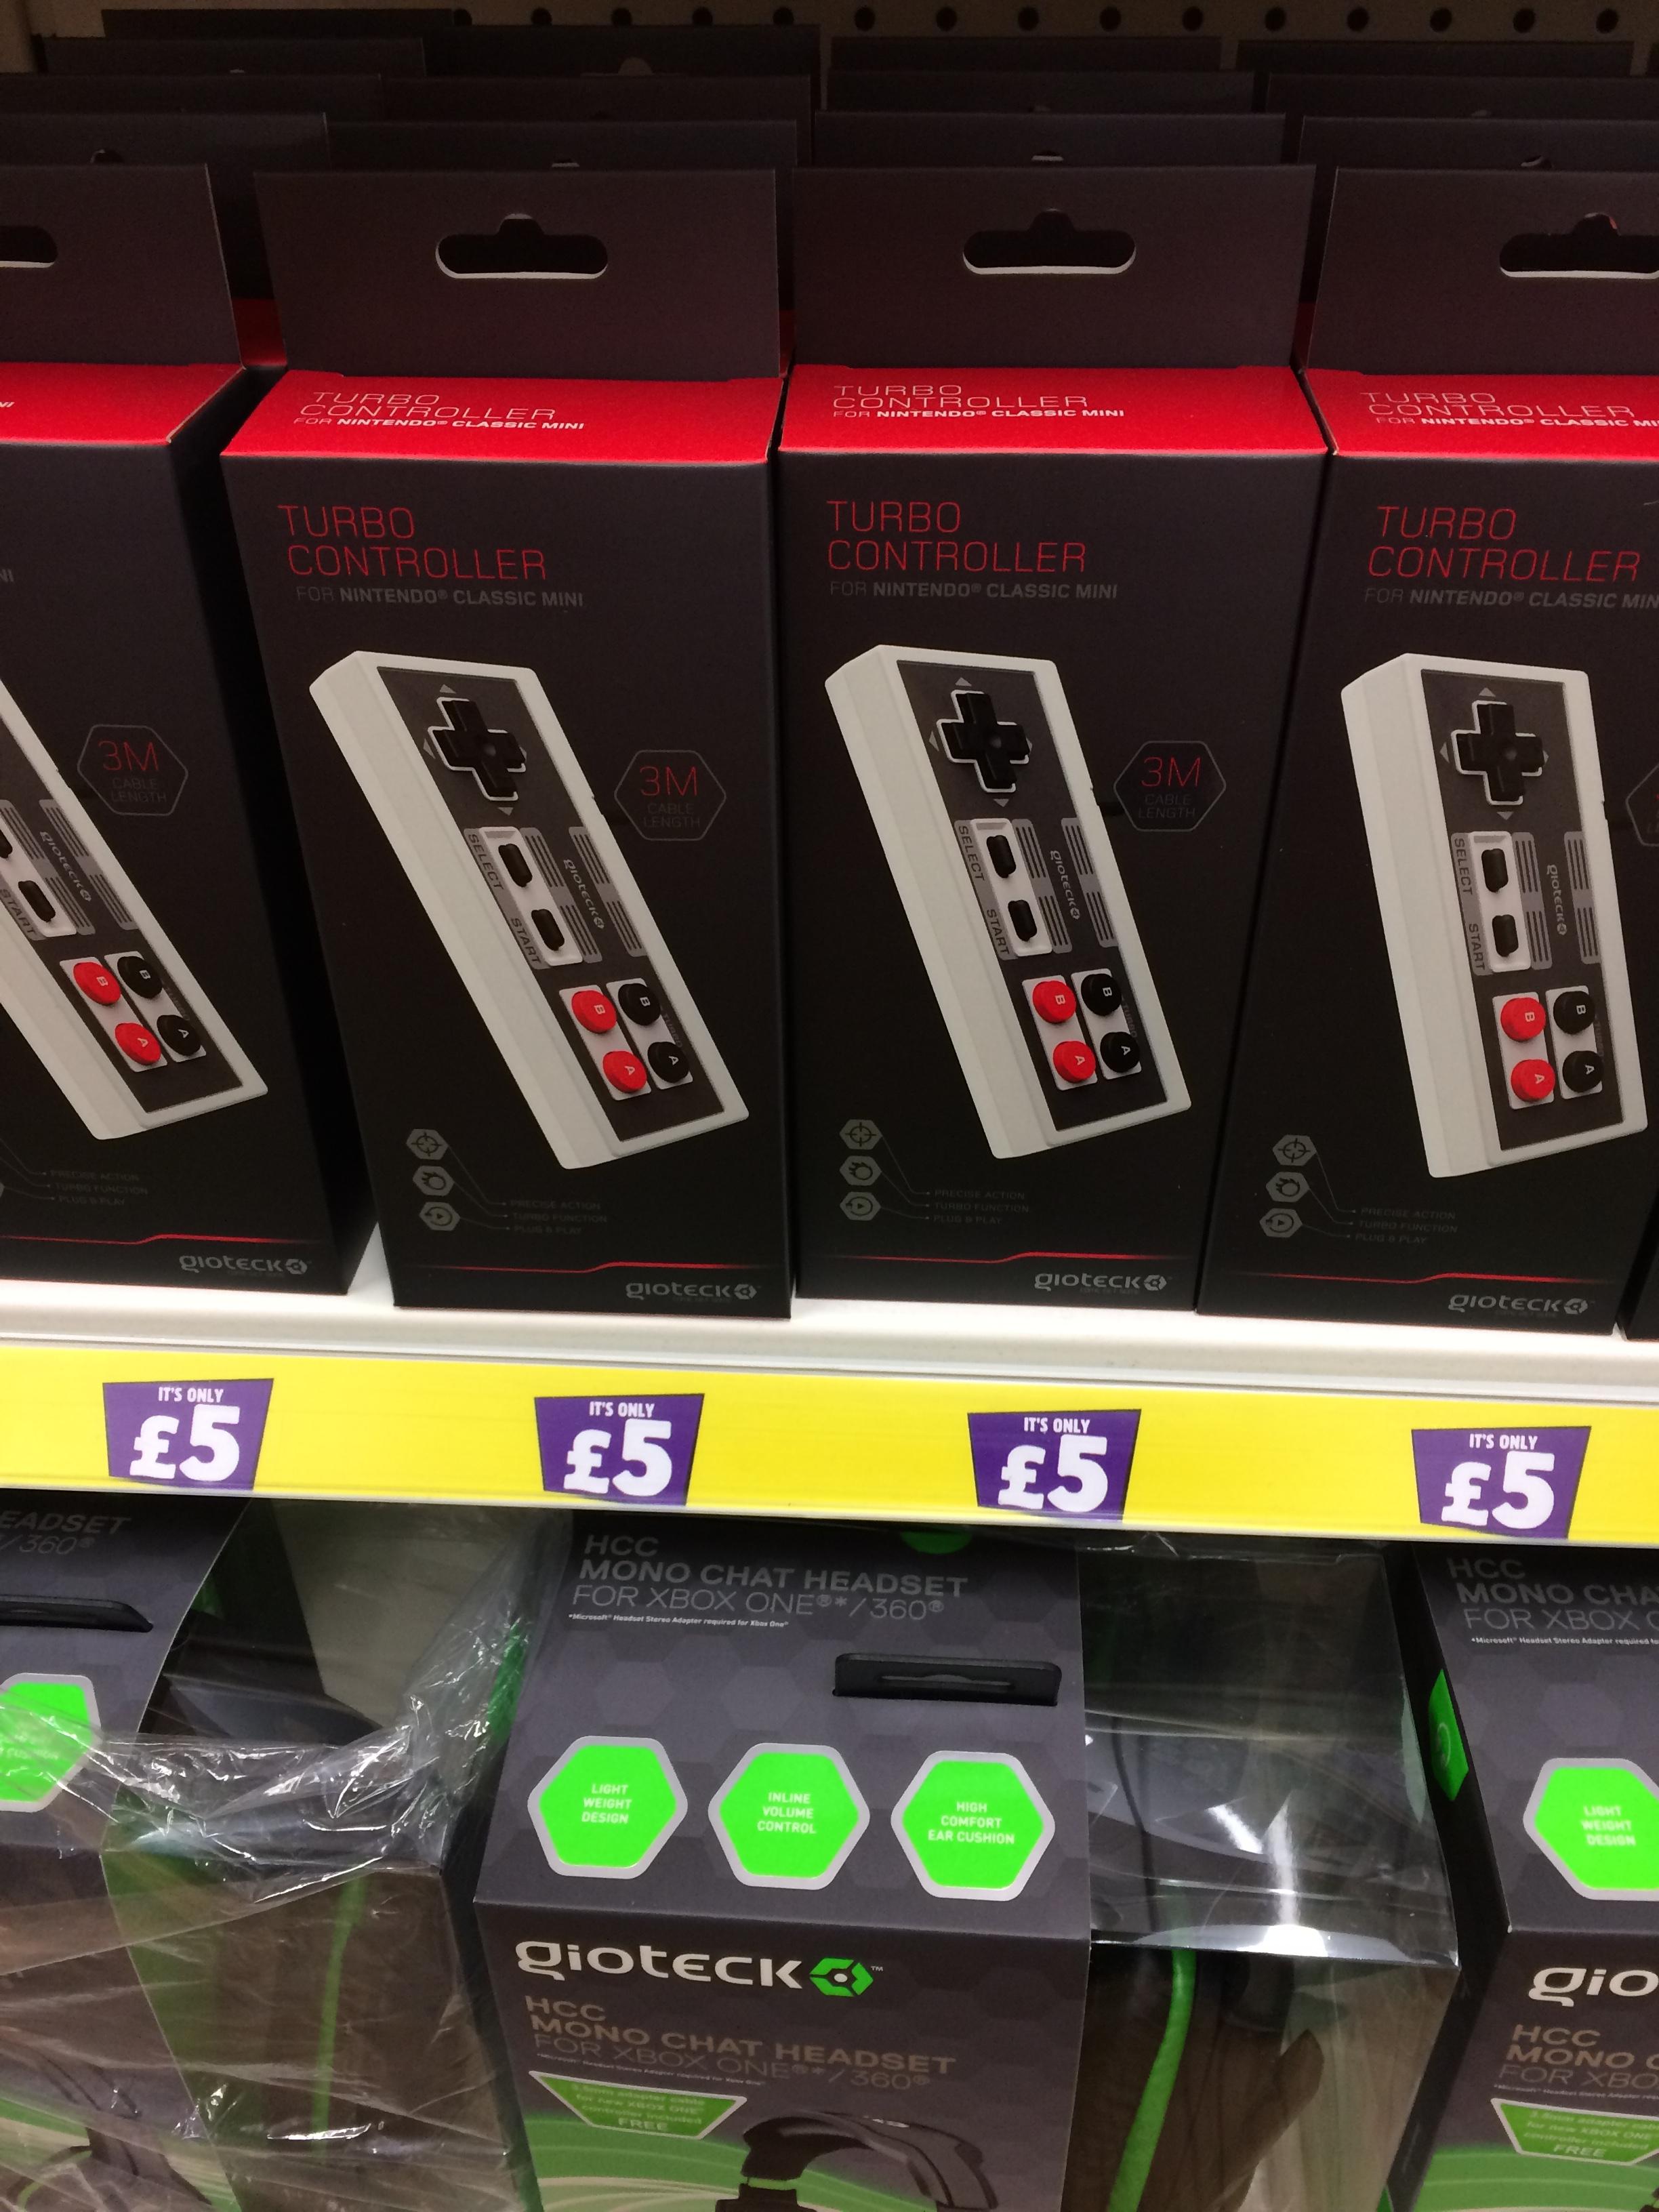 Gioteck Nintendo mini controller £5 @ Poundland